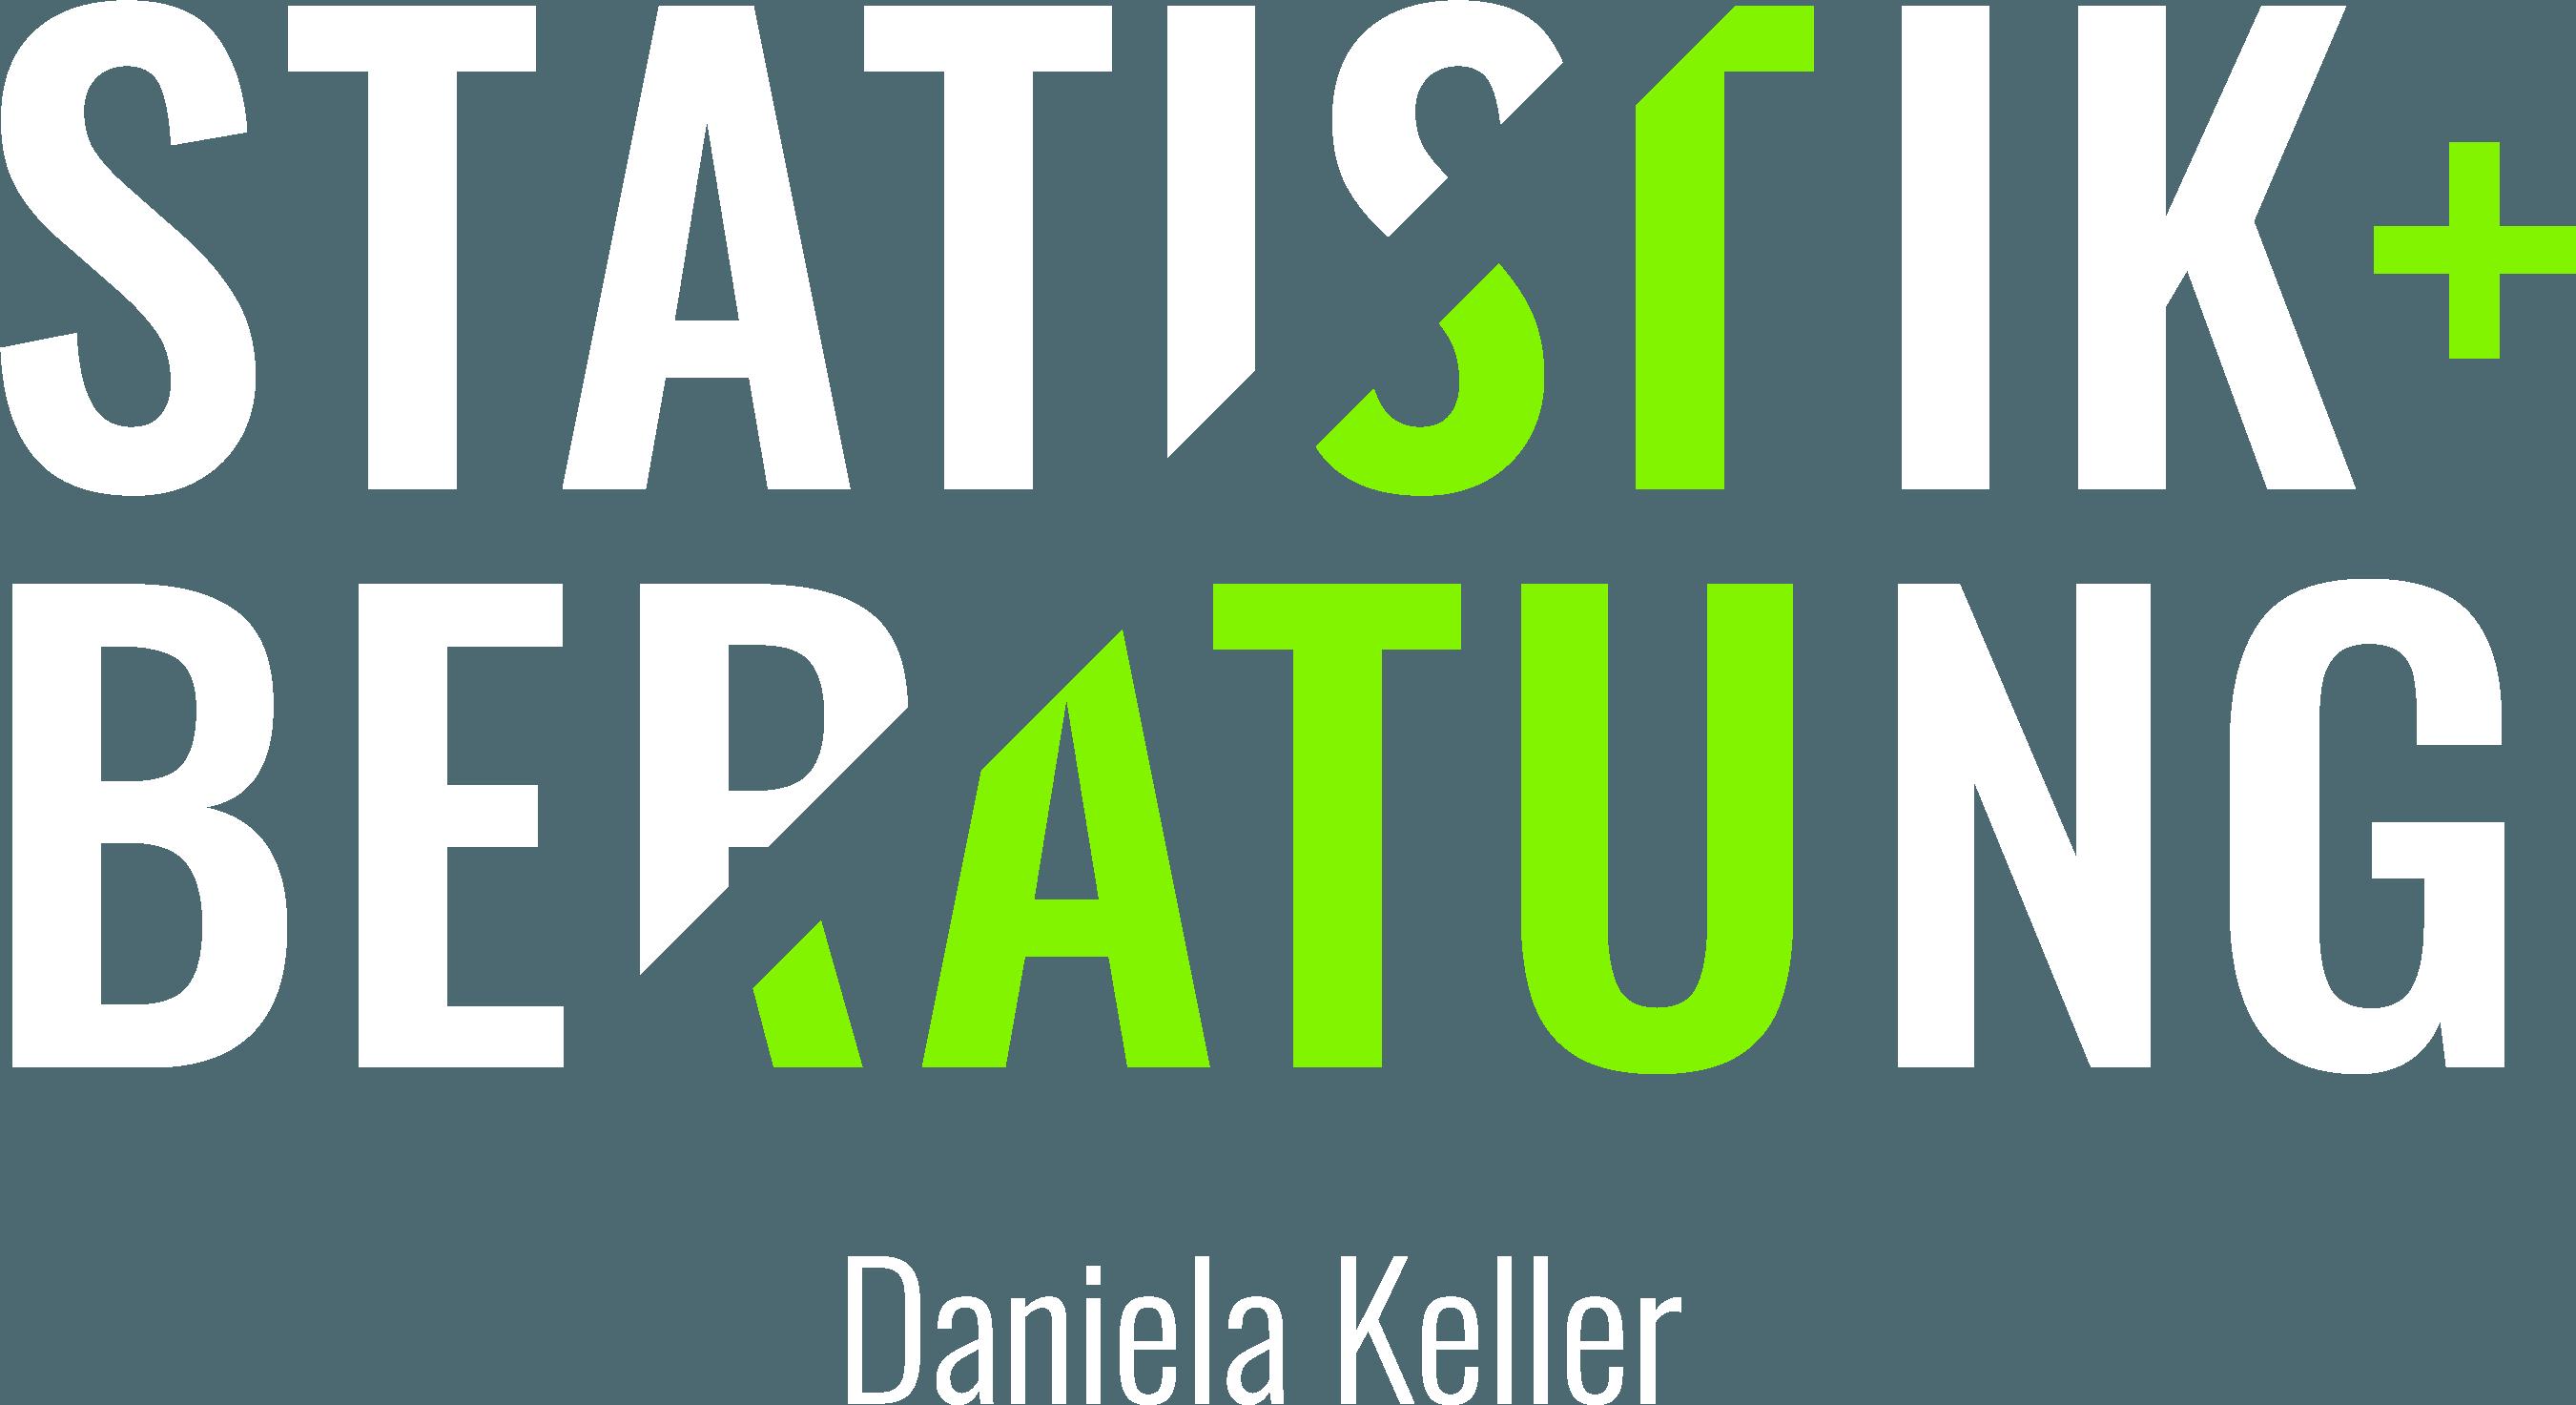 Statistik und Beratung - Daniela Keller